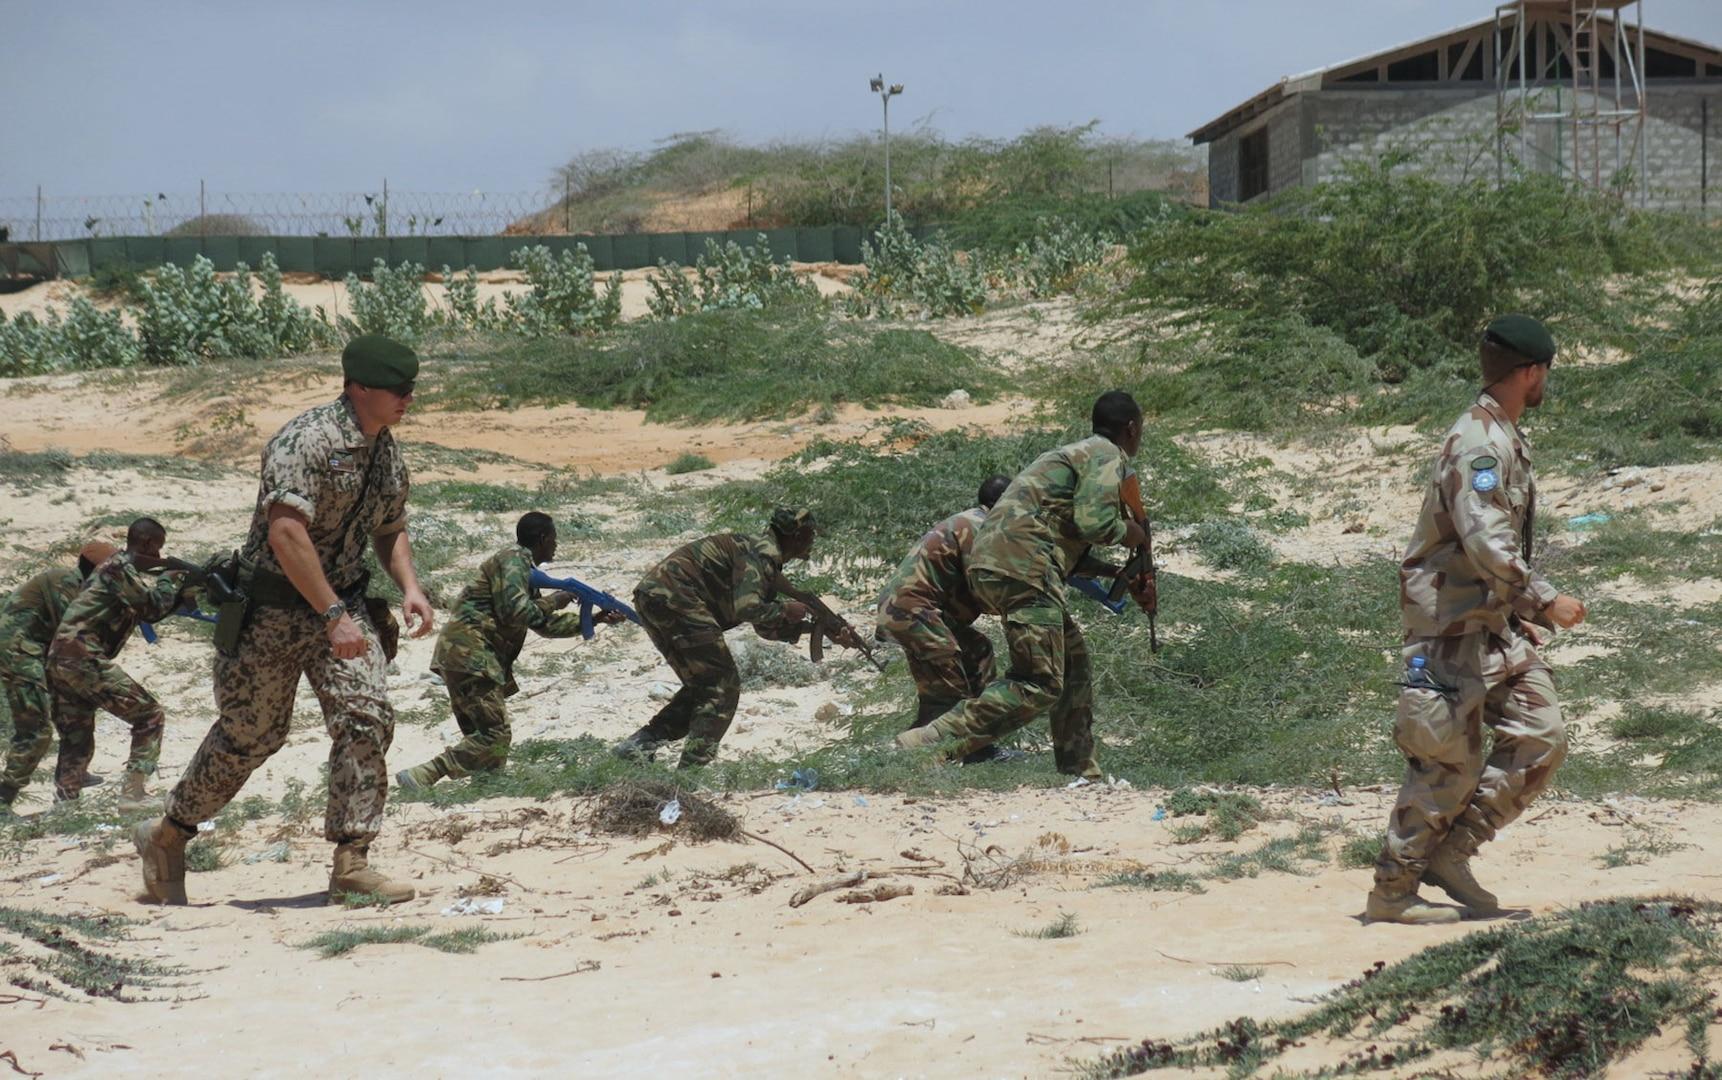 Instructors from the European Union Training Mission in Somalia (EUTM) take Somali National Army (SNA) soldiers through training drills at Jazeera Training Camp in Mogadishu. AMISOM (Raymond Baguma, 25 March 2015)